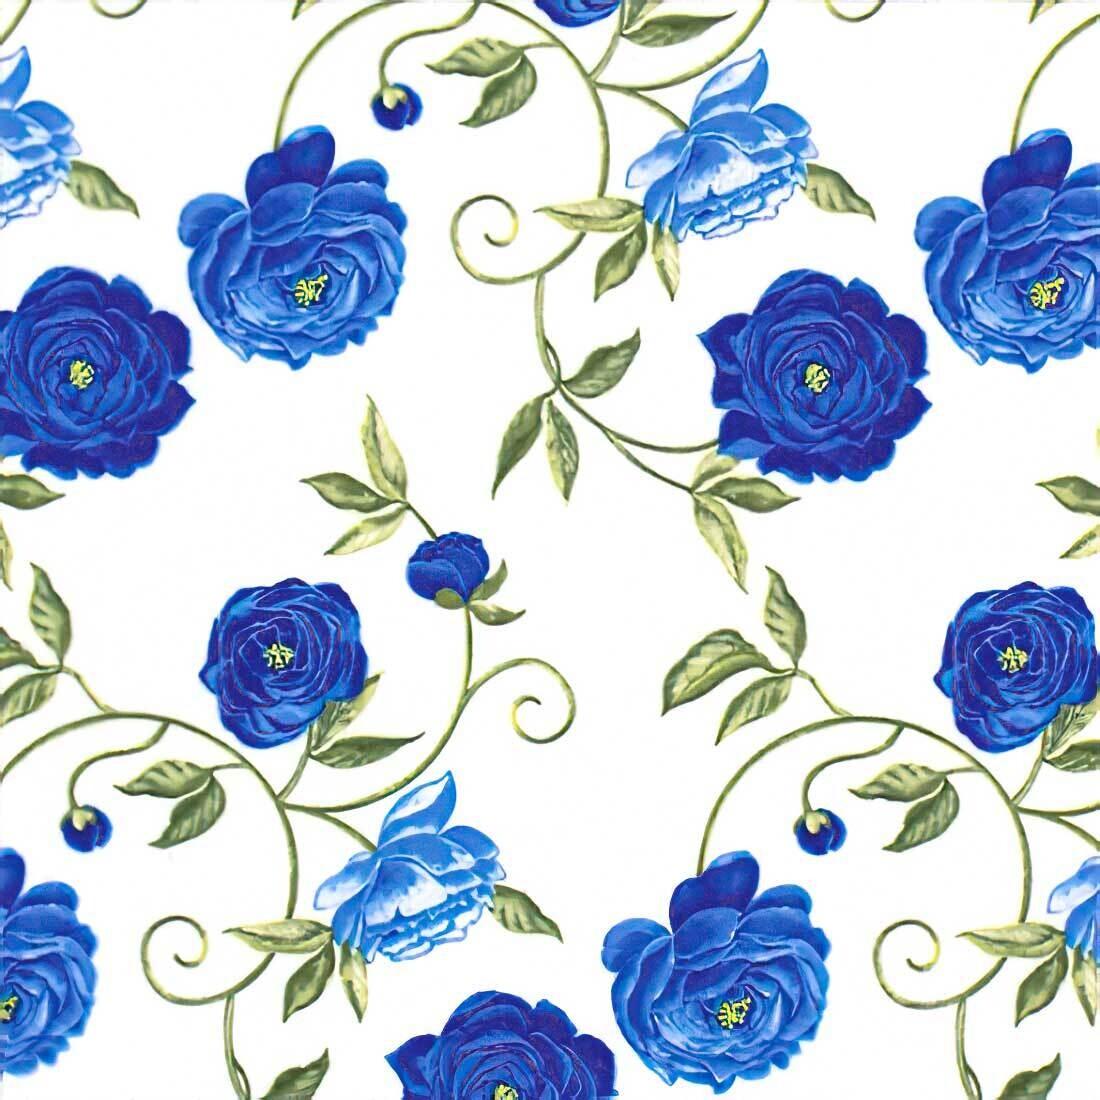 Decoupage Paper Napkins - Floral - Peony Blue (1 Sheet)